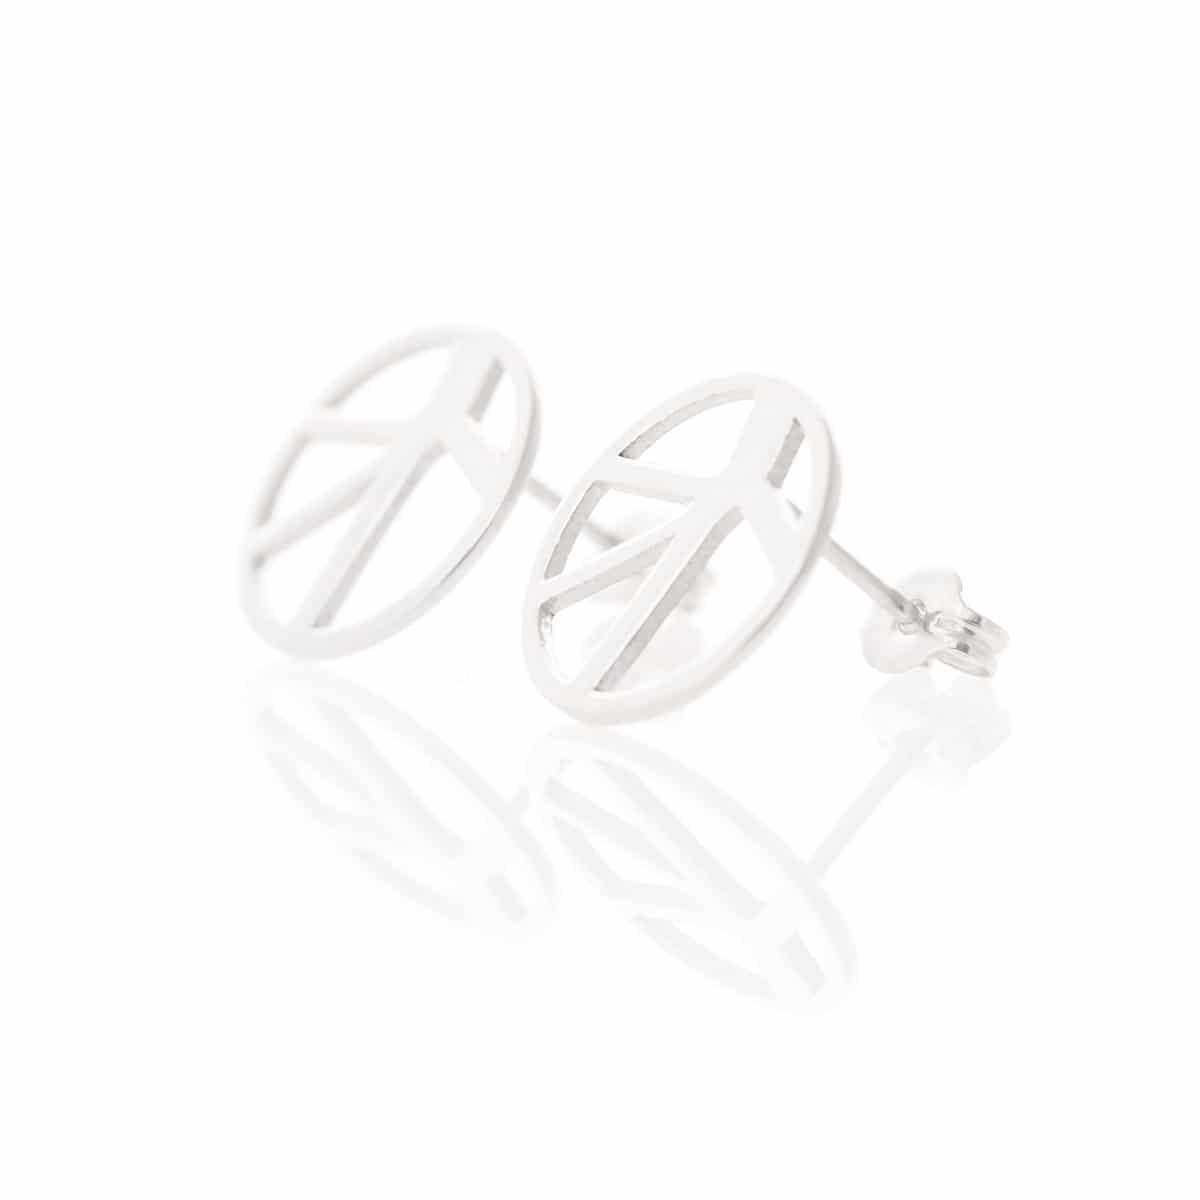 8-Vornoi-earrings-silver-1200px